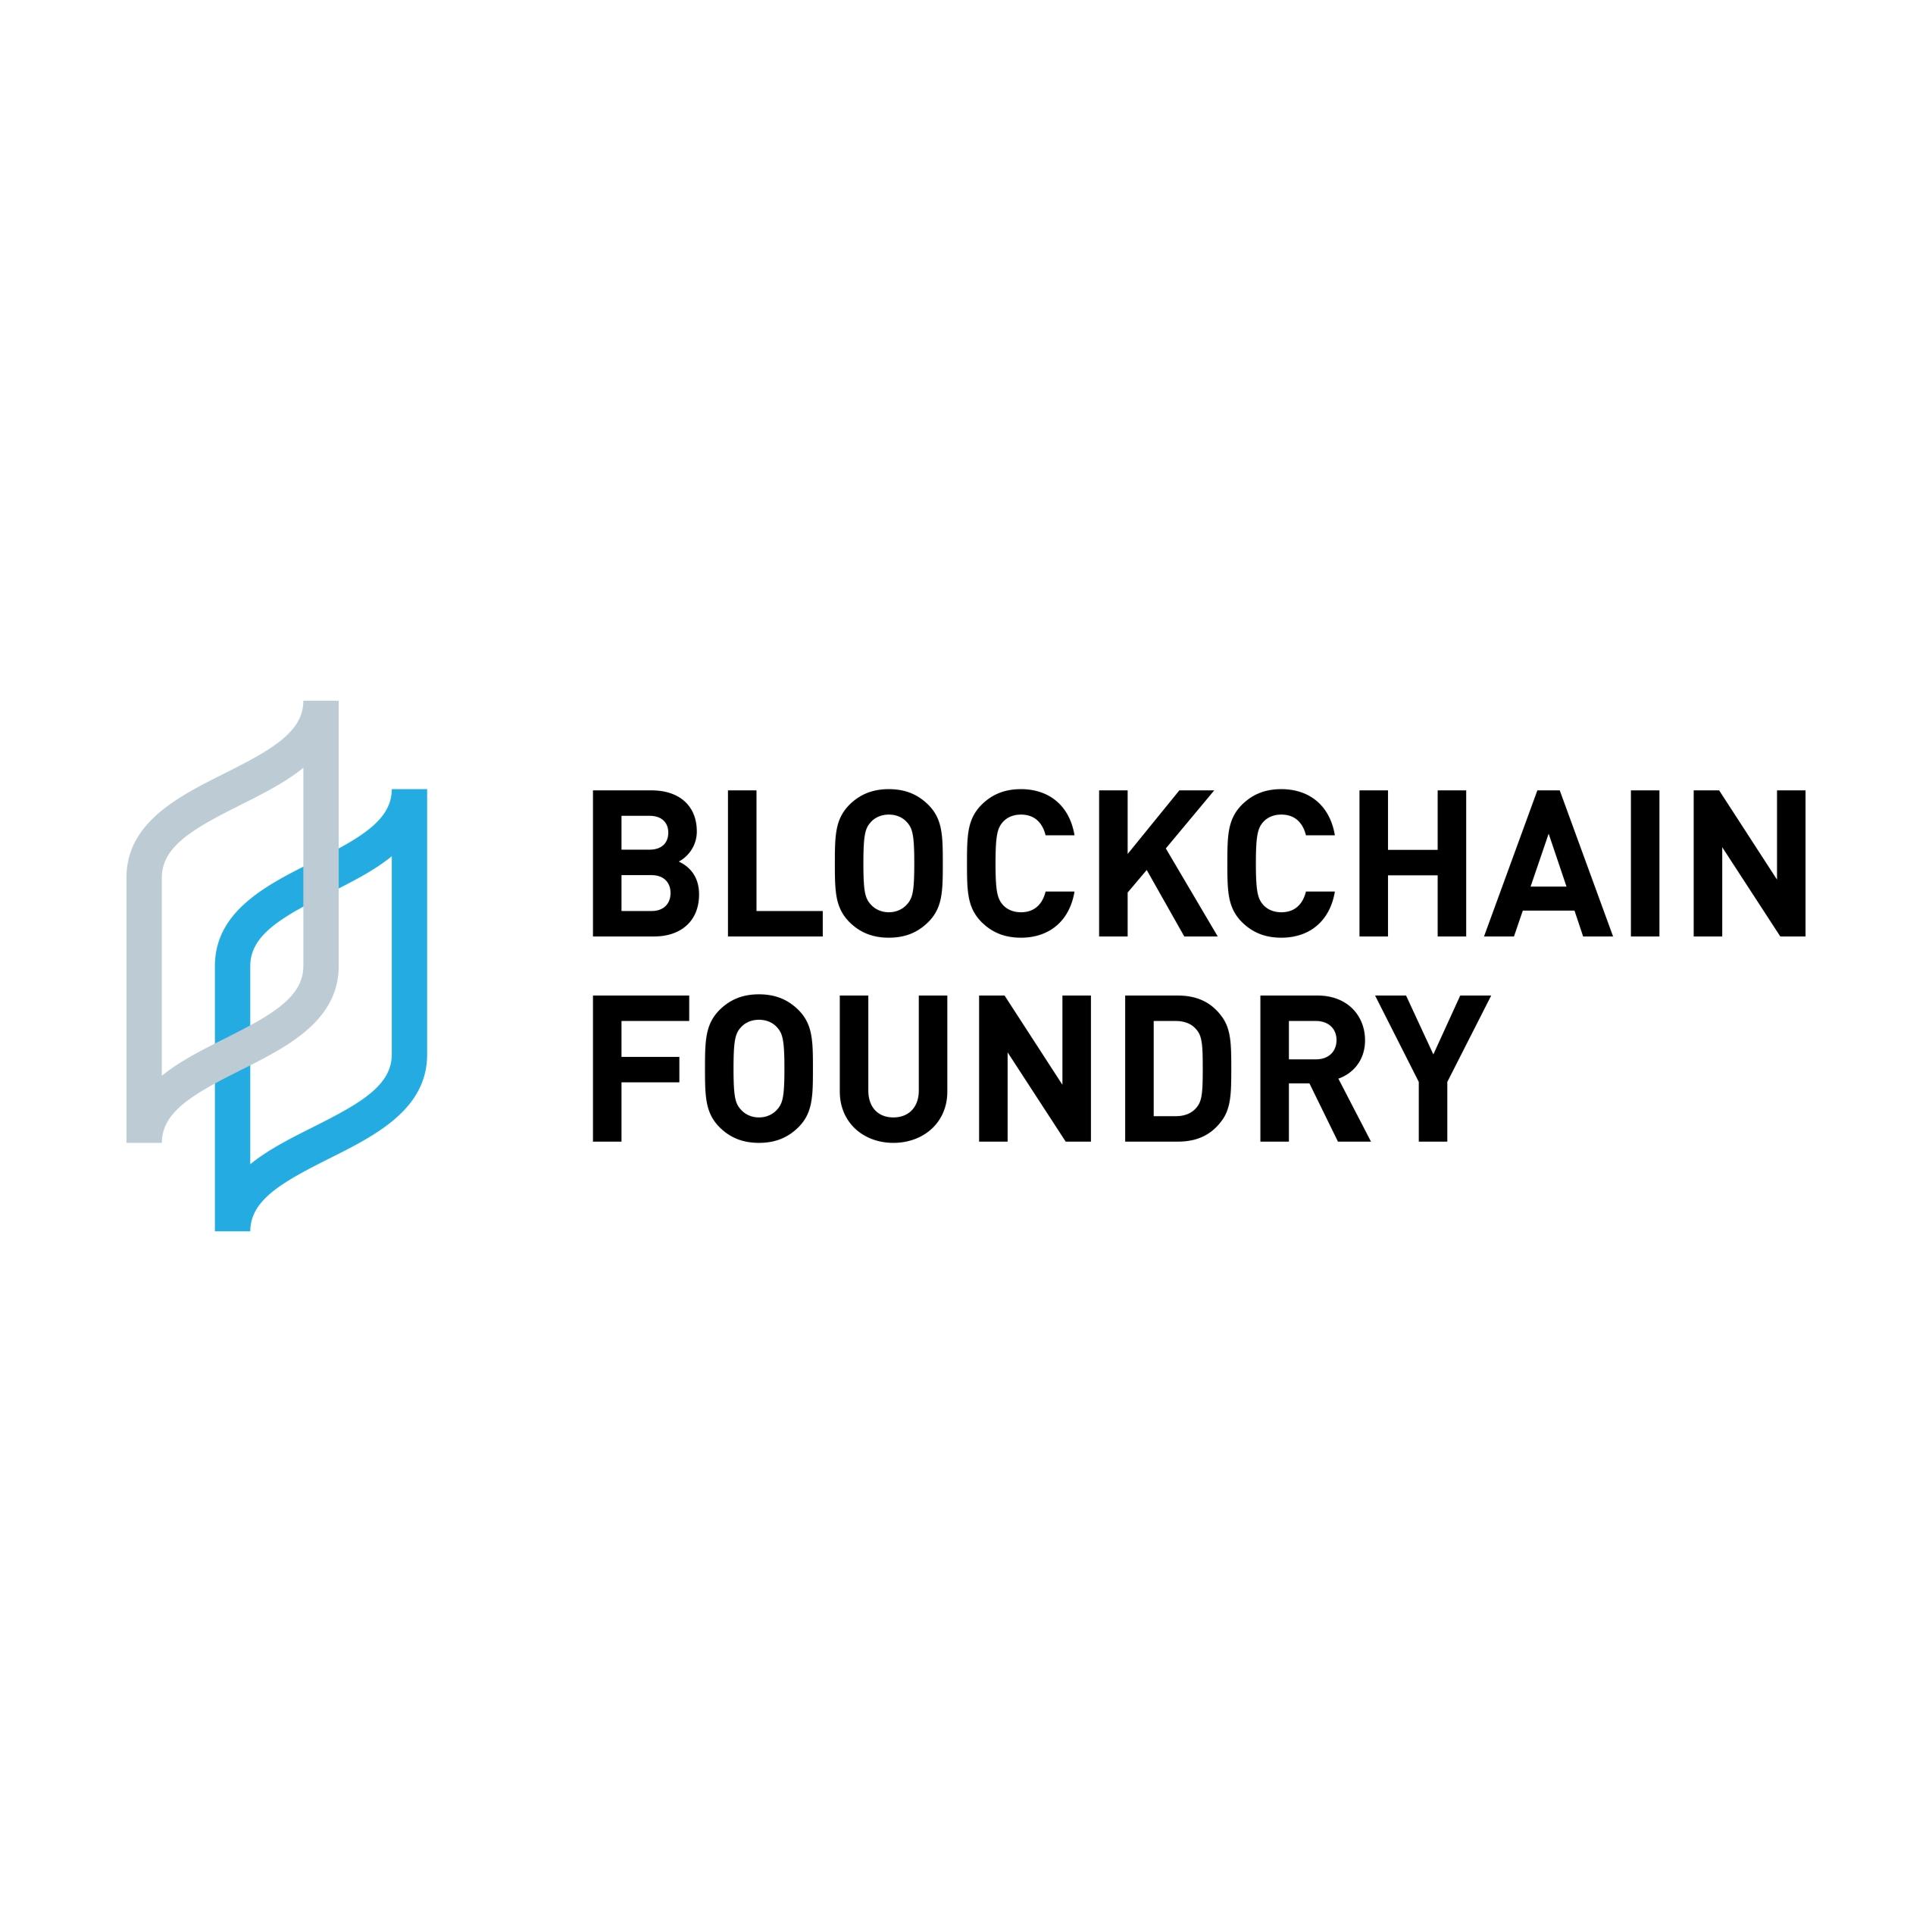 Blockchain Foundry Announces Blockchain Development Agreement with Financial Services Client